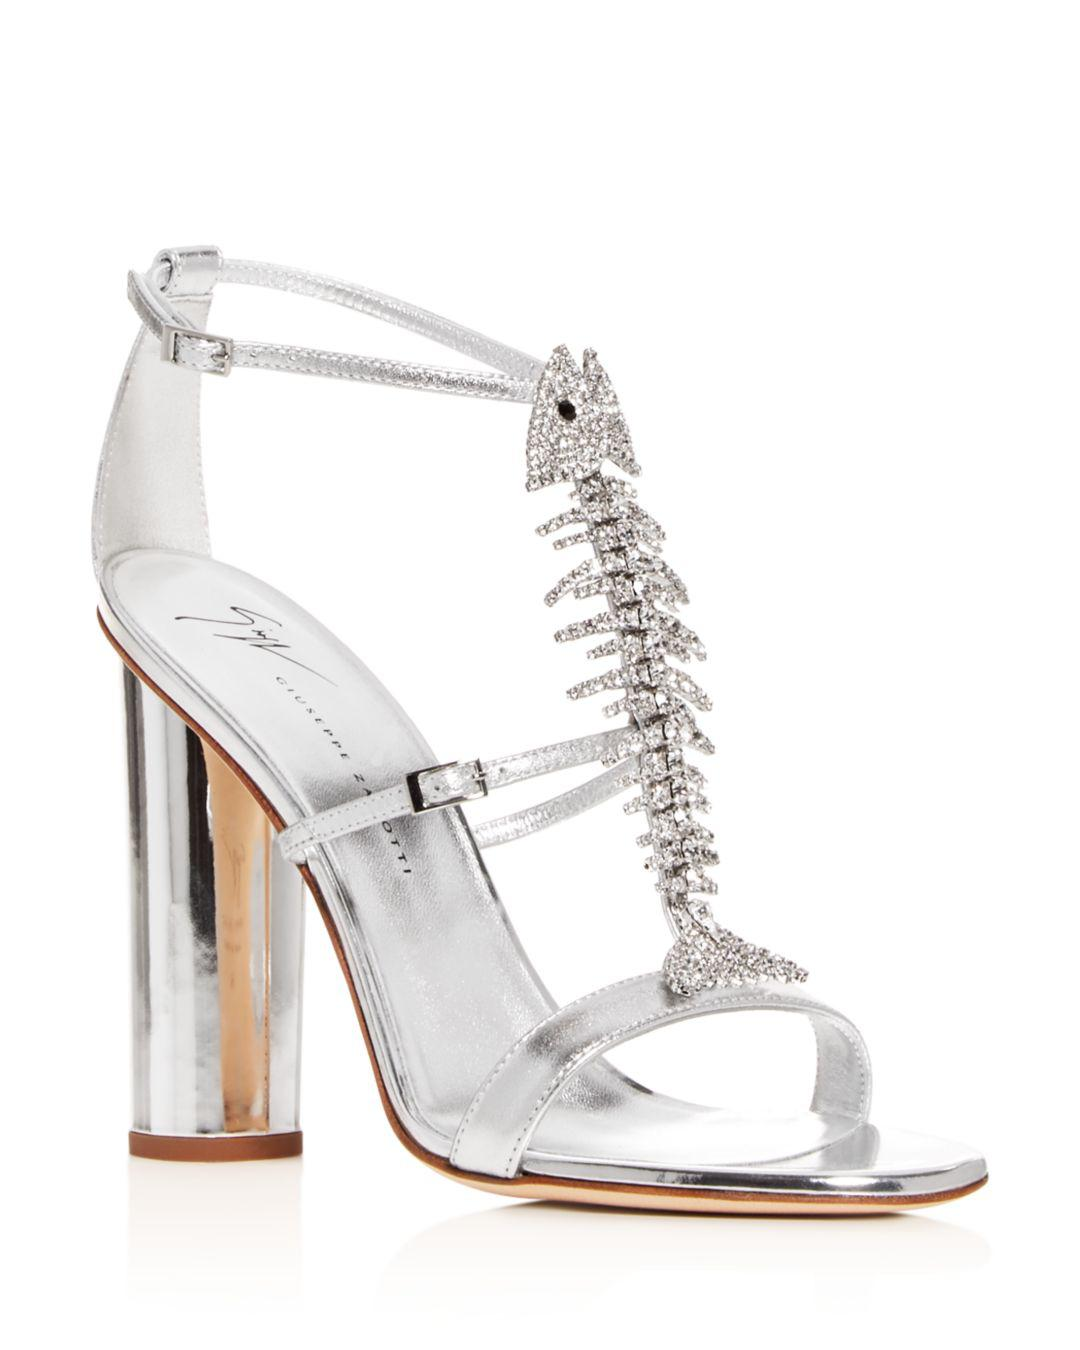 aec4046a5c6 Lyst - Giuseppe Zanotti Women s Svamp Embellished High-heel Sandals ...